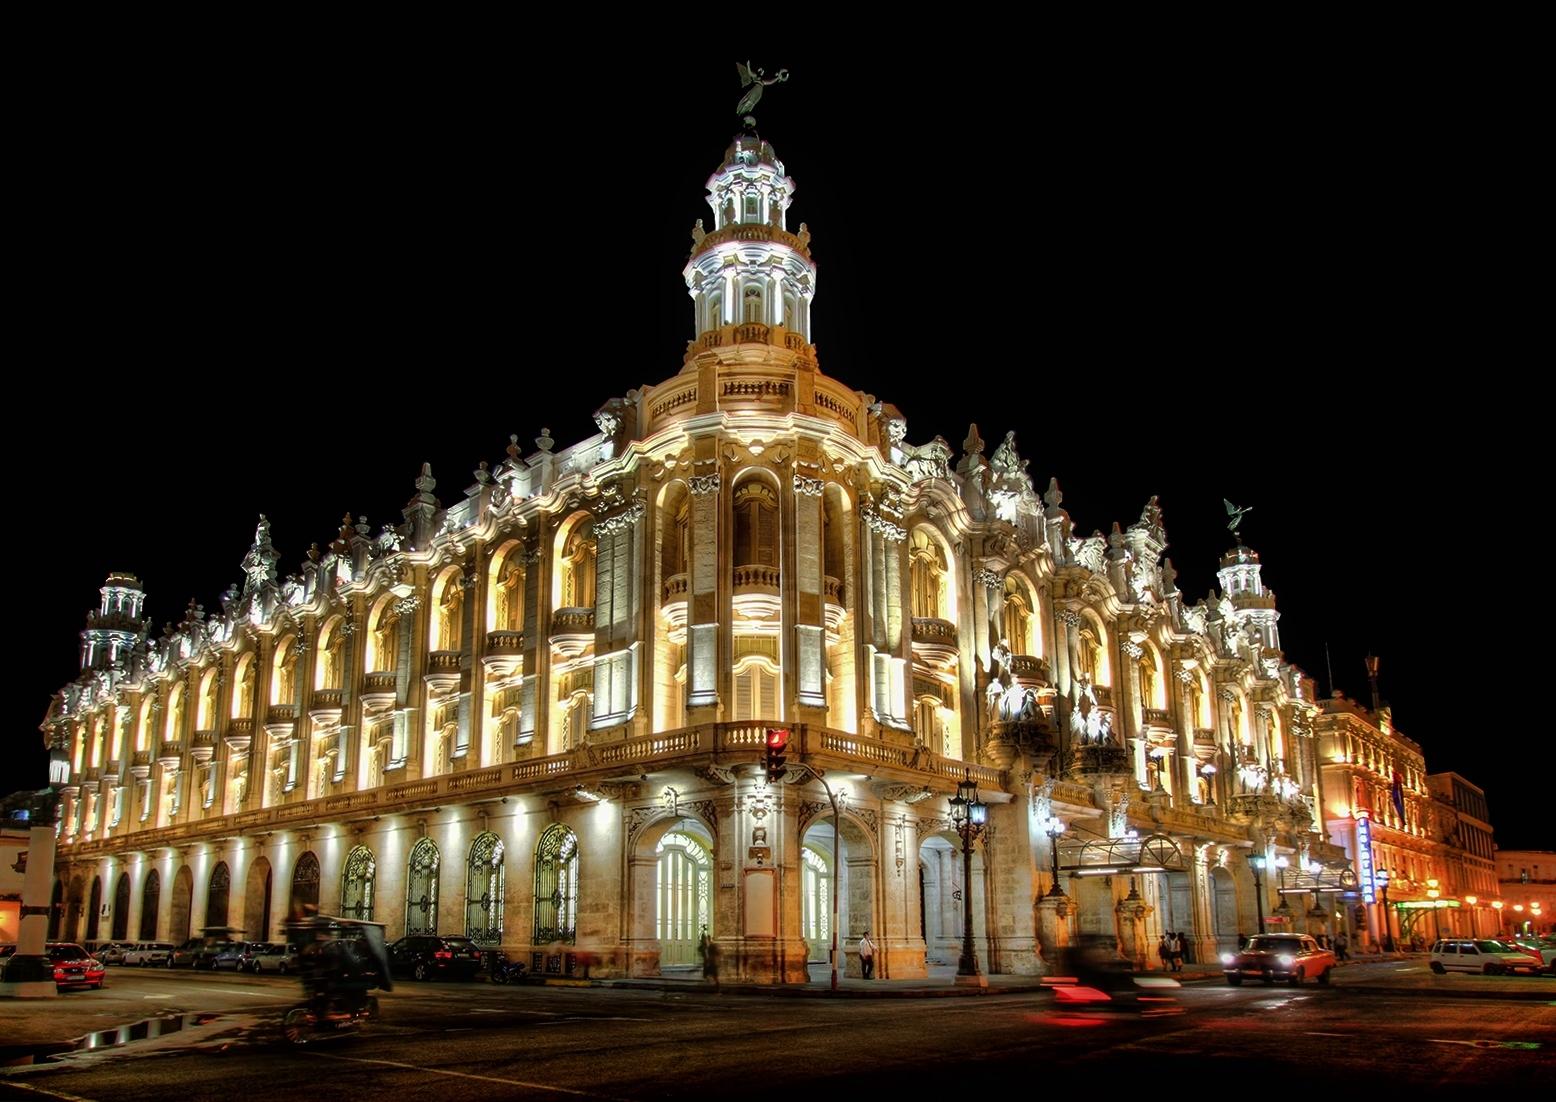 The-Gran-Teatro-de-La-Habana-Alicia-Alonso-a-neo-baroque-design-built-as-a-Galician-social-club-TB-1-Place-by-Mike-Felder-SR